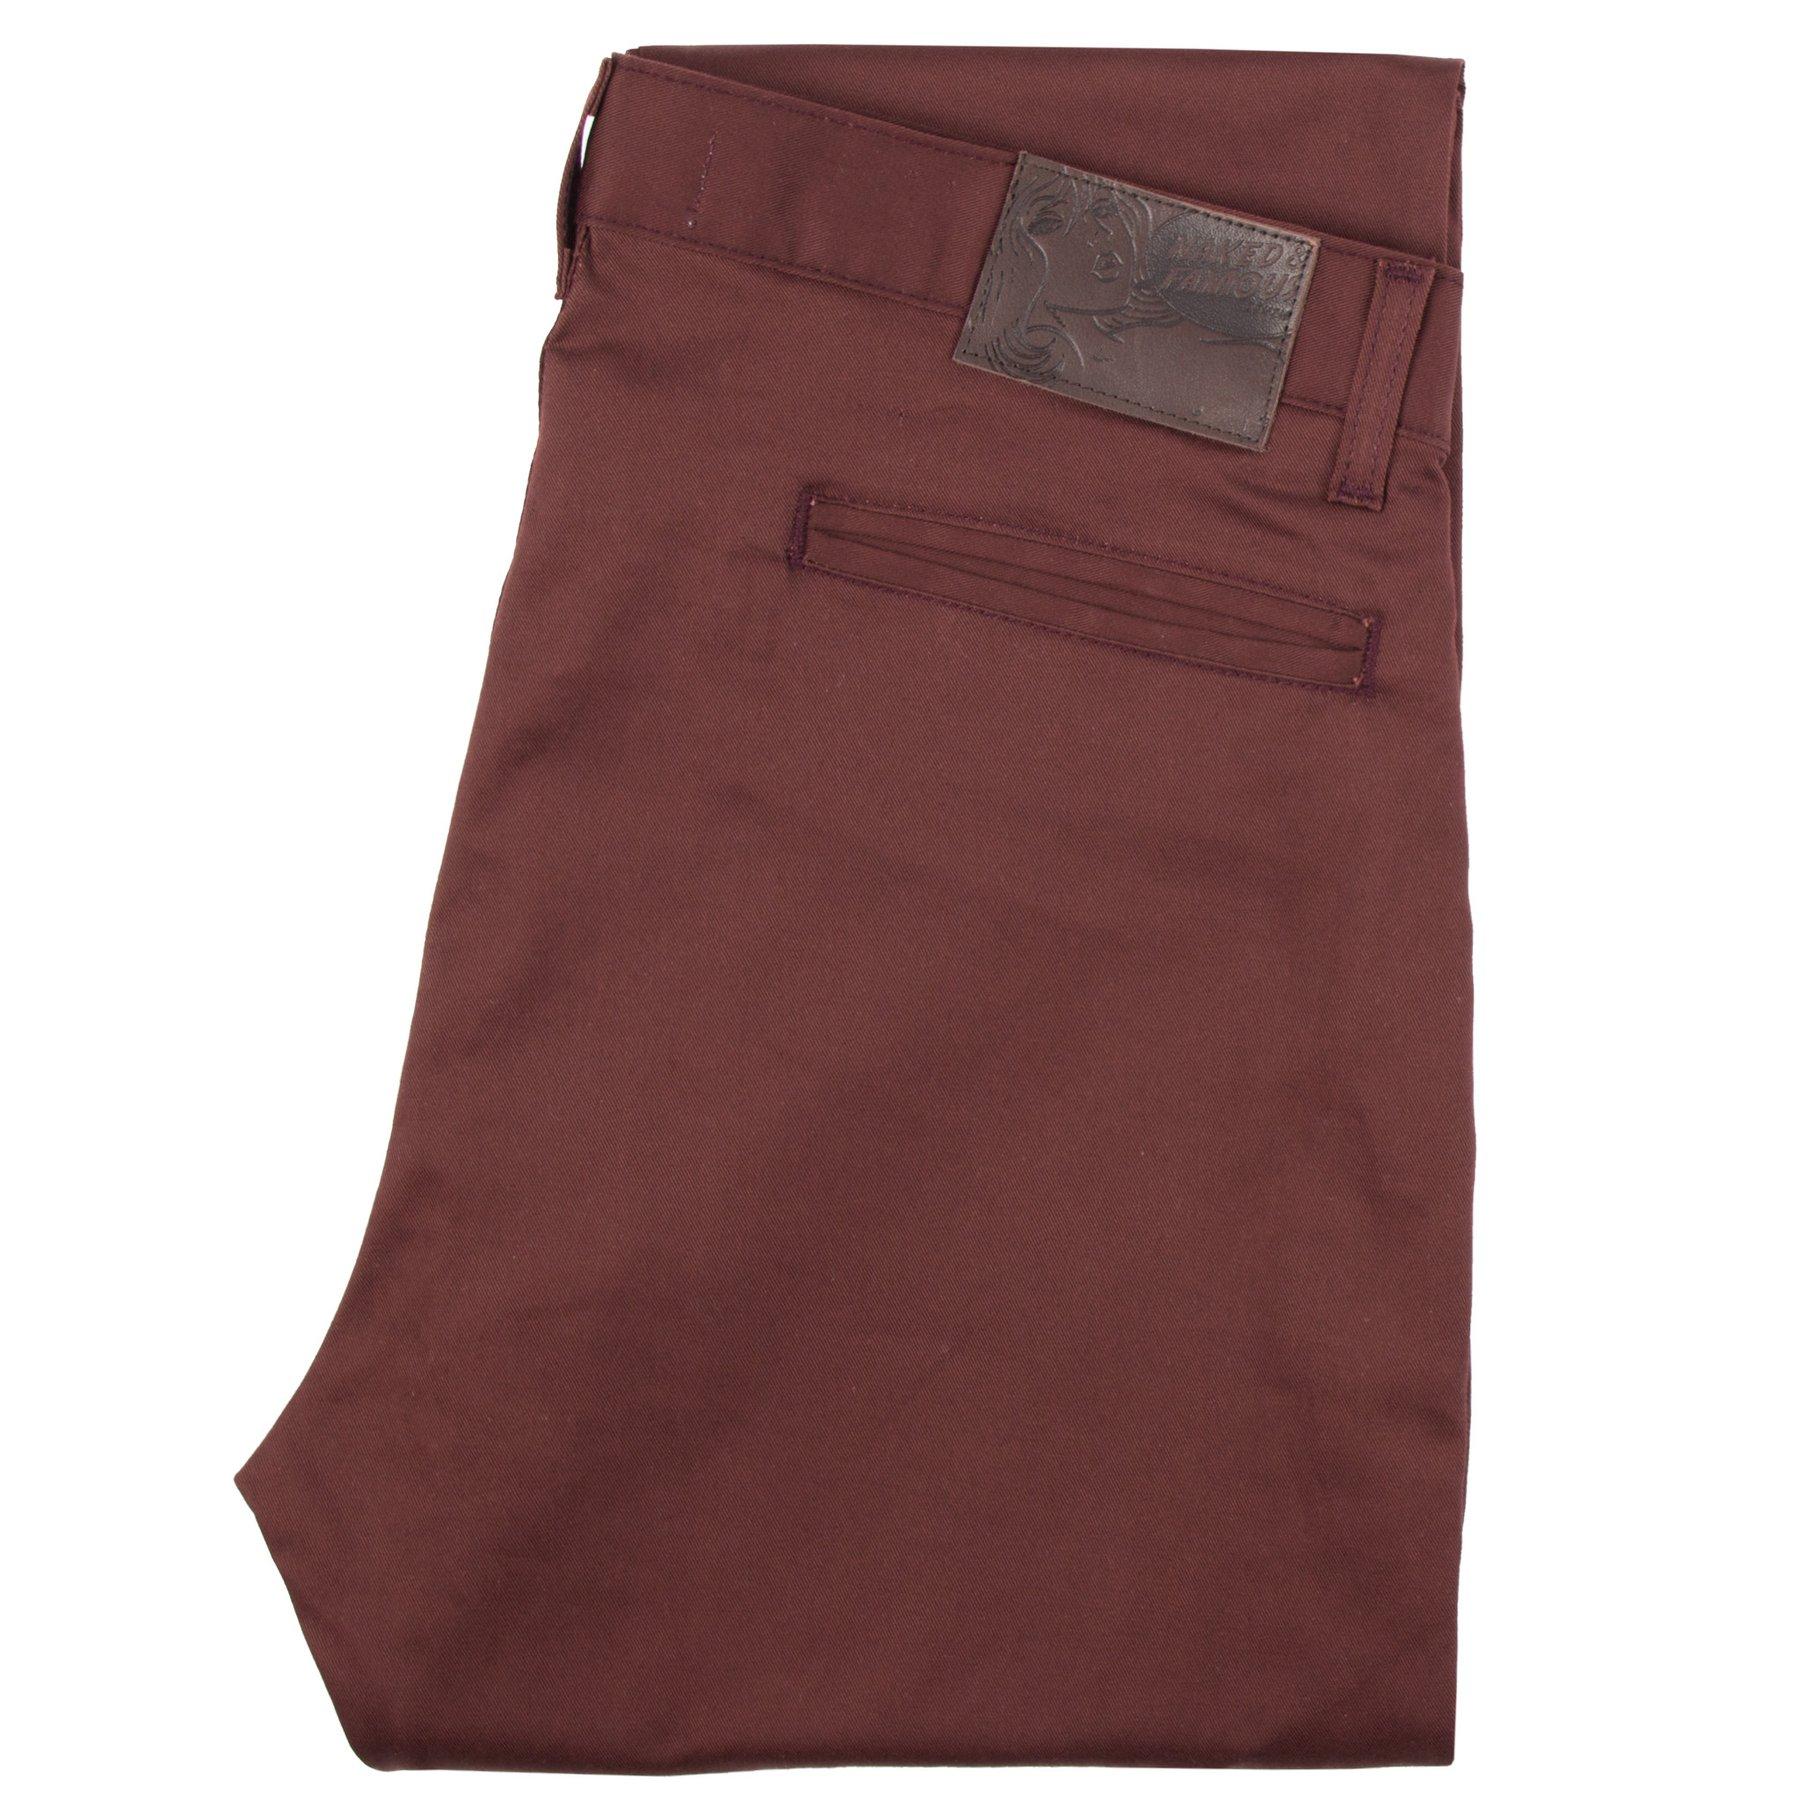 burgundy stretch twill - Slim Chino